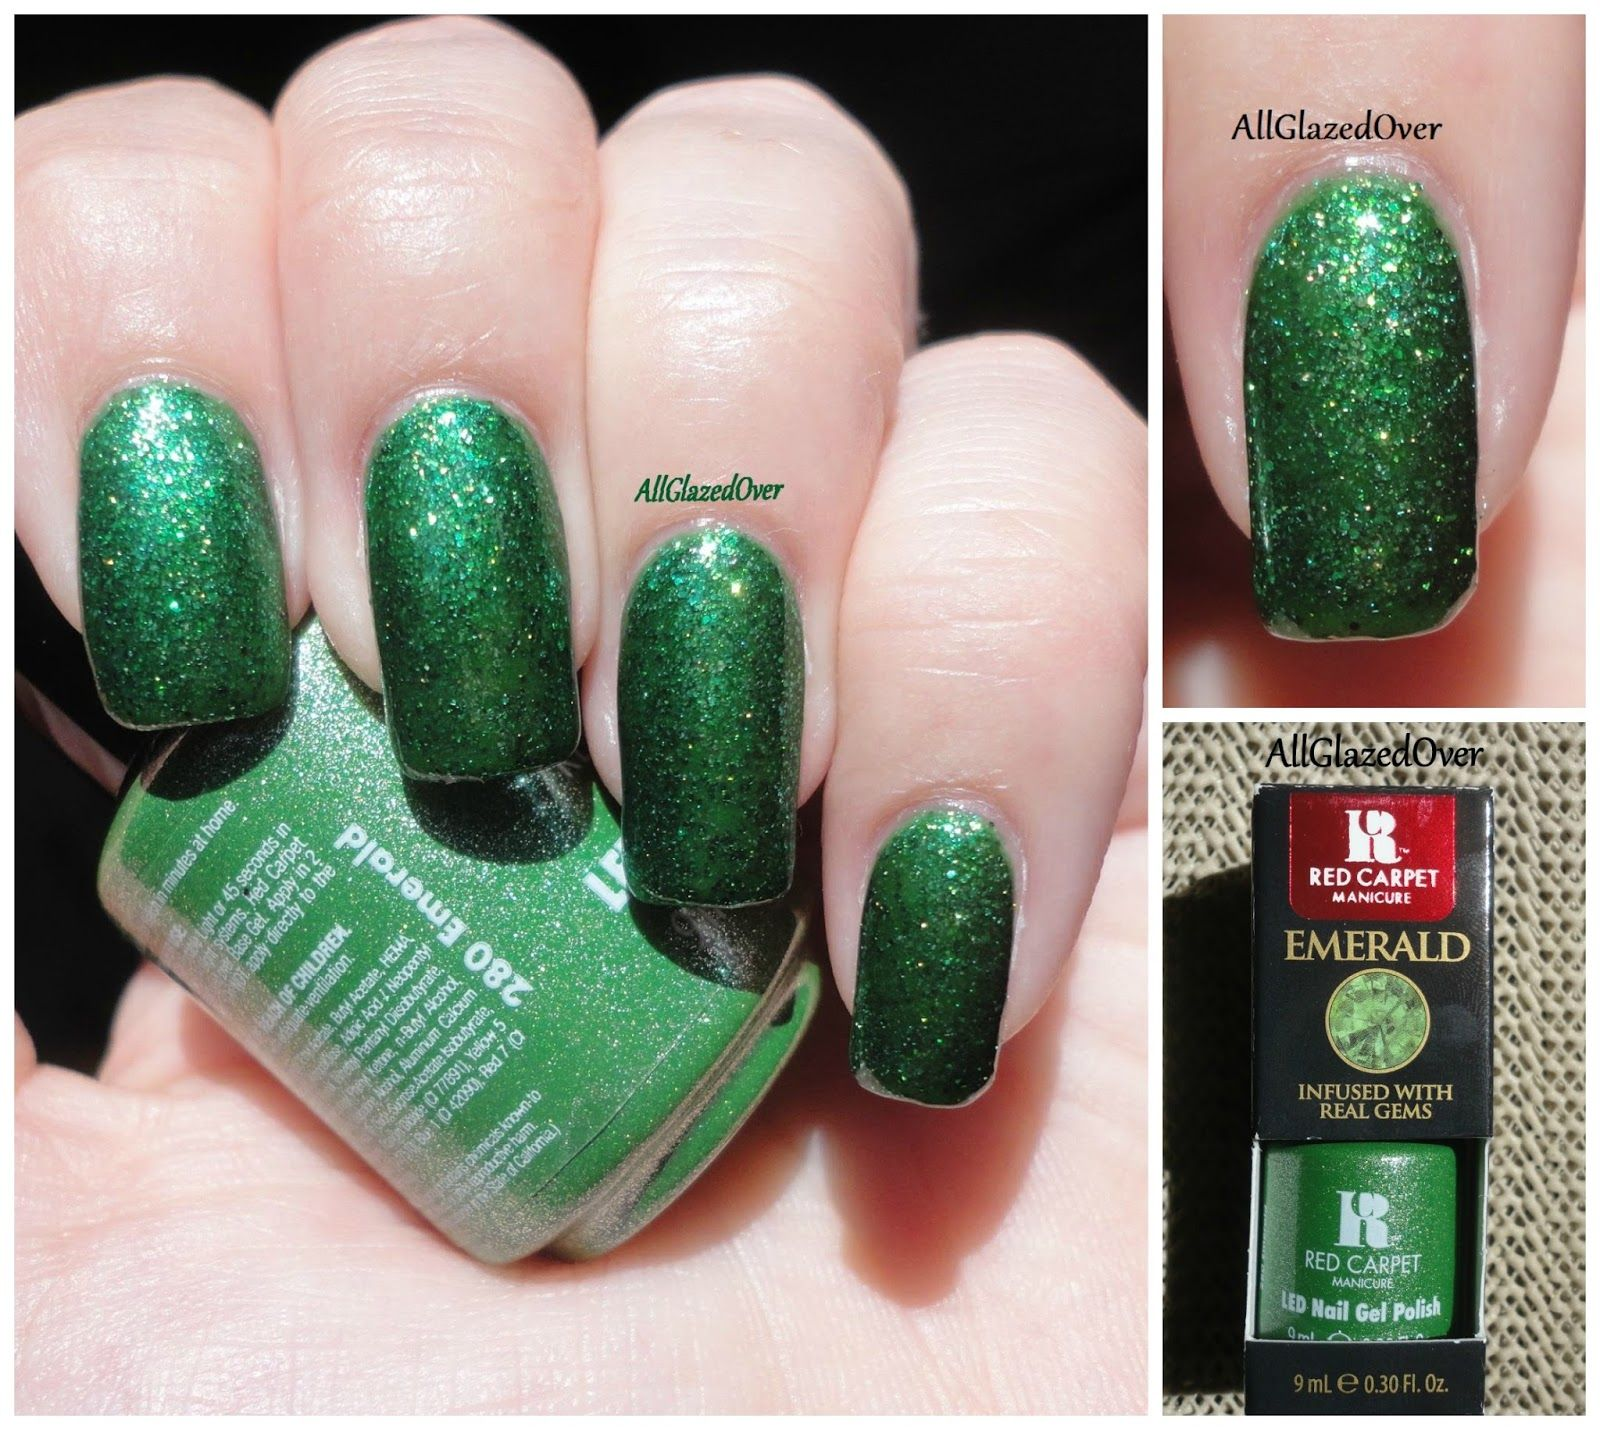 redcarpetmani Emerald | nails | Pinterest